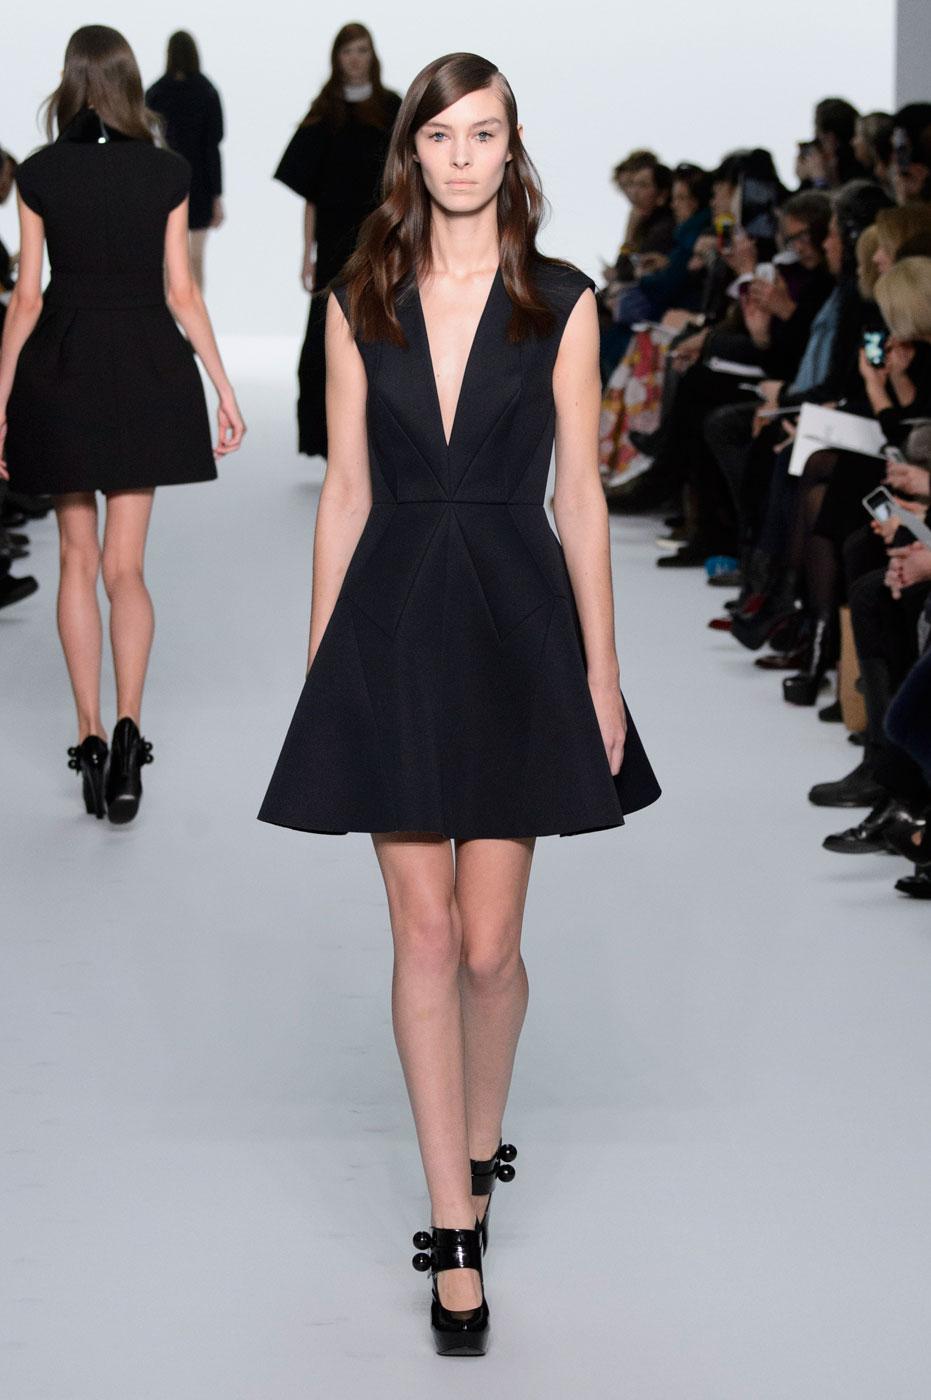 Kayek-fashion-runway-show-haute-couture-paris-spring-summer-2015-the-impression-05